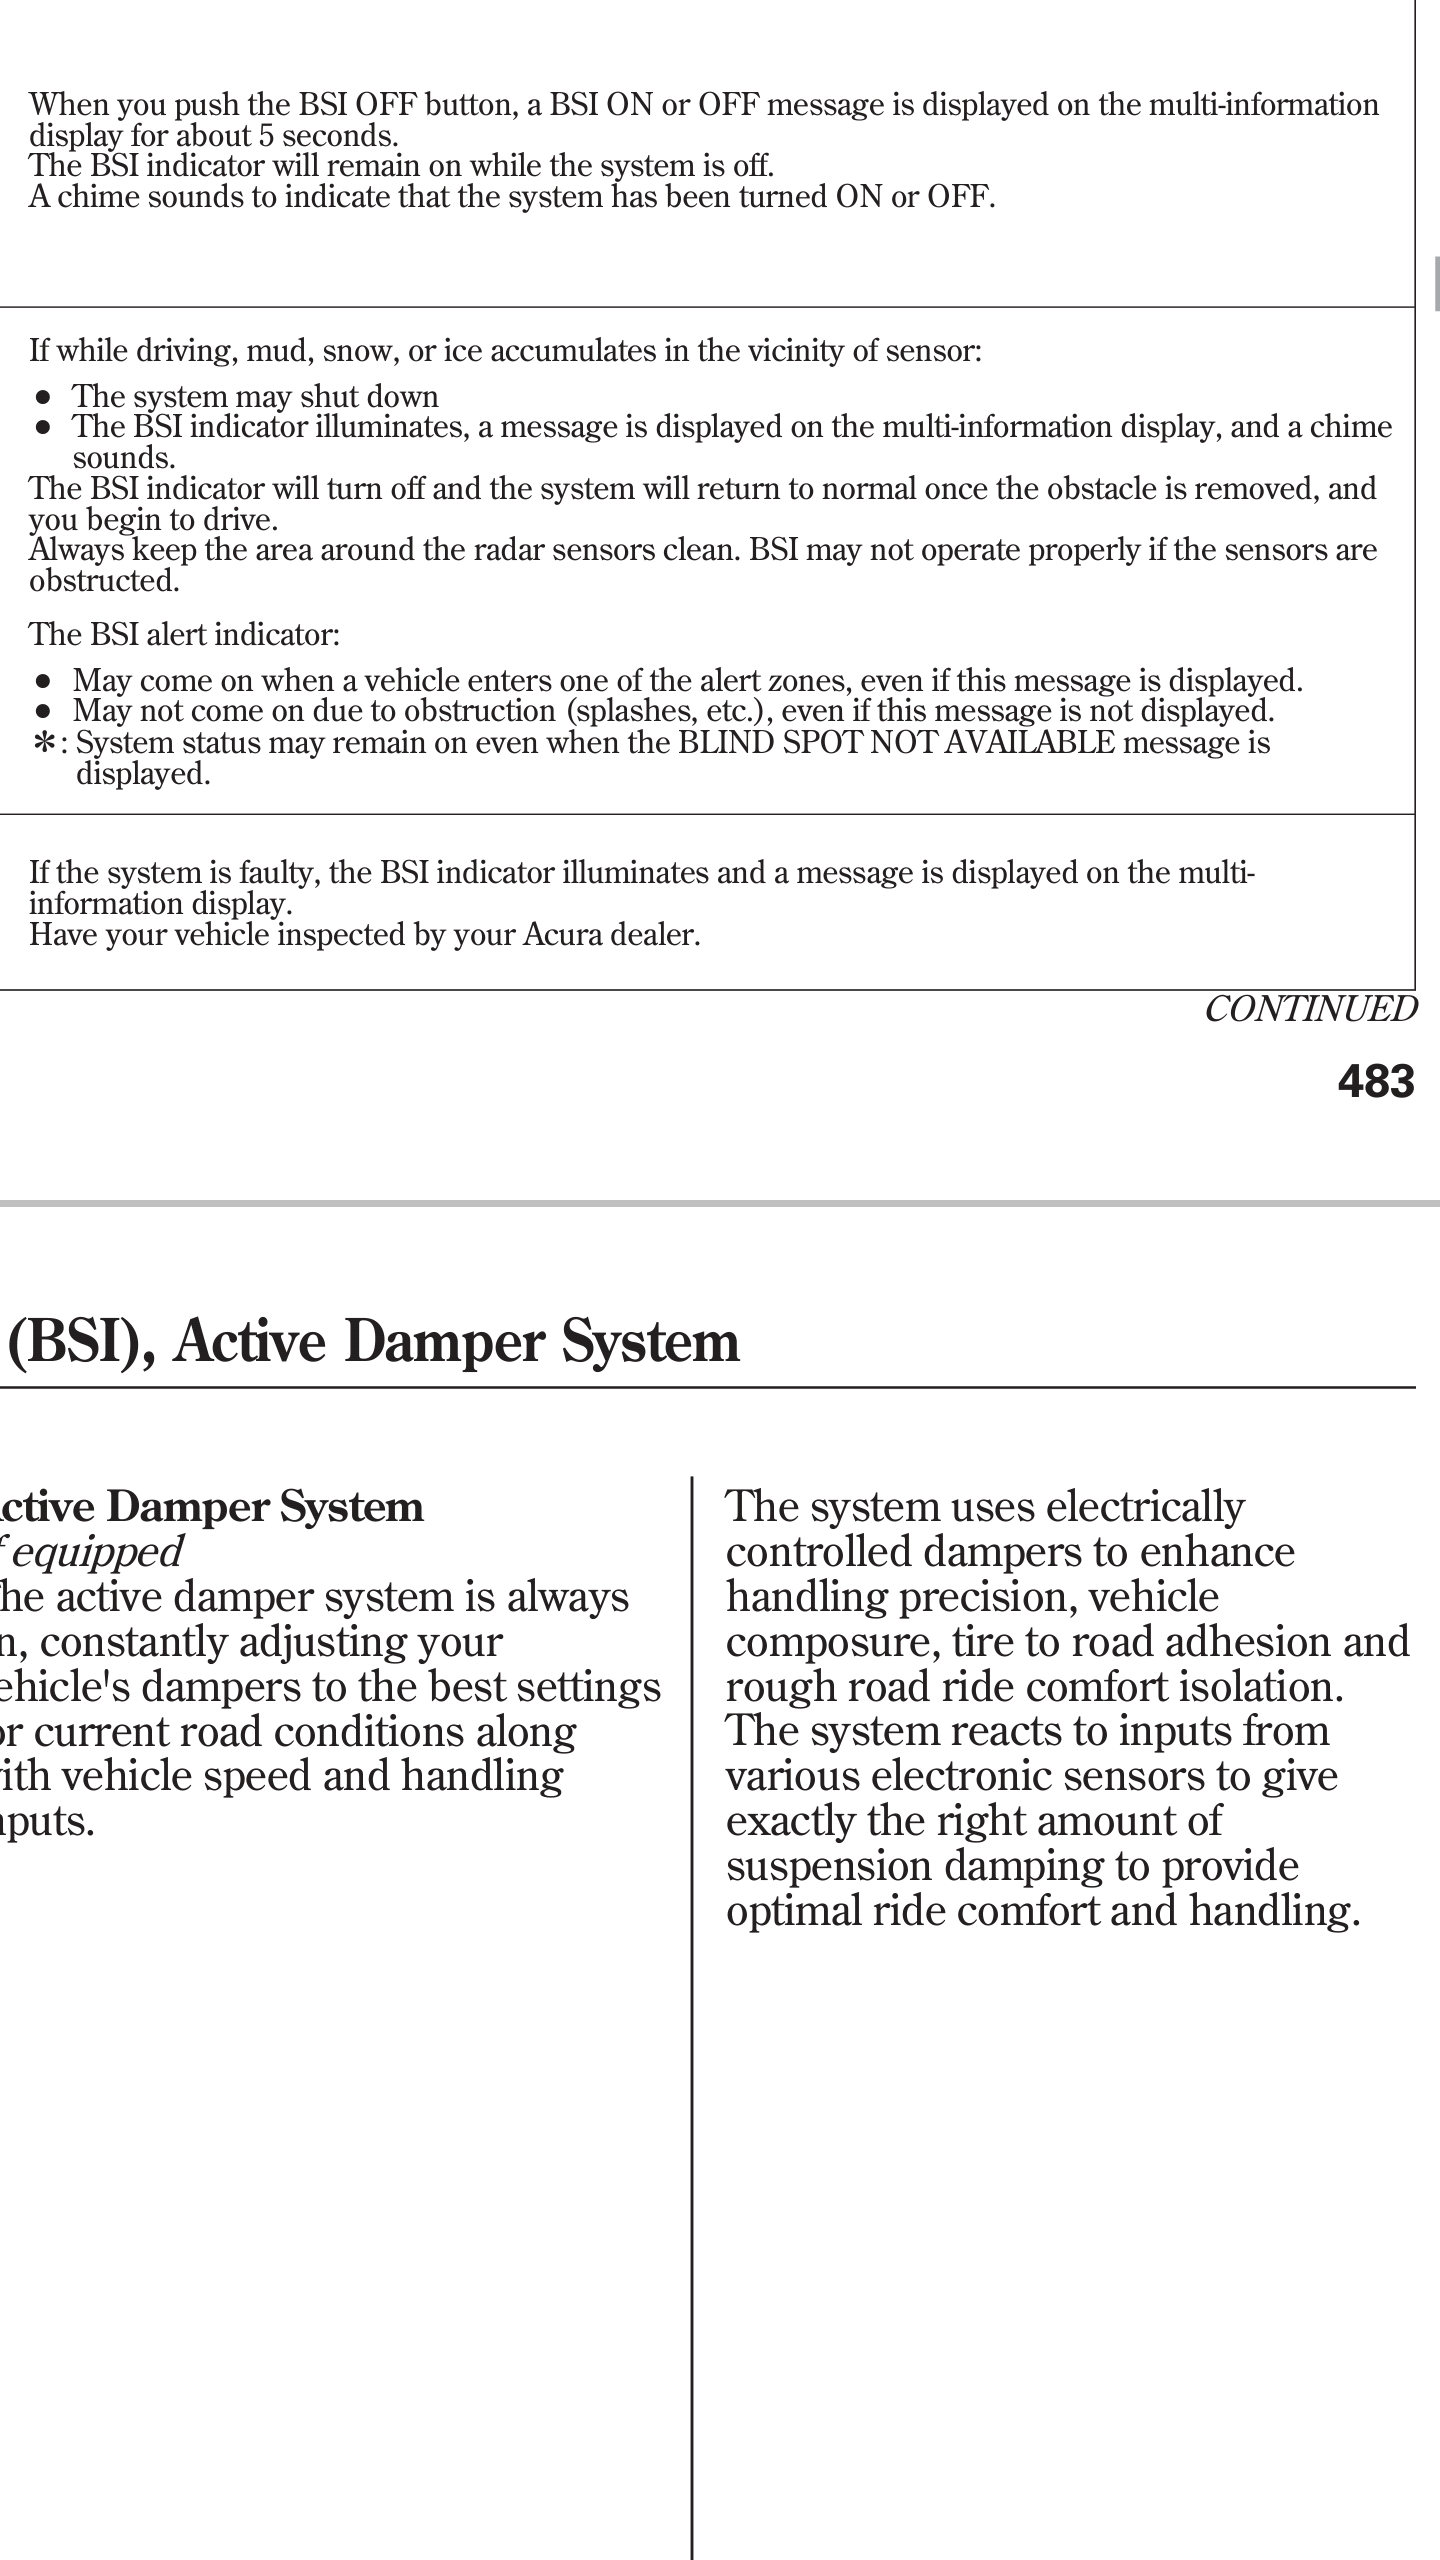 2010 Blind Spot Information Wiring Diagram Acura Mdx Forum Backup Camera For 07 Click Image Larger Version Name Screenshot 2016 02 21